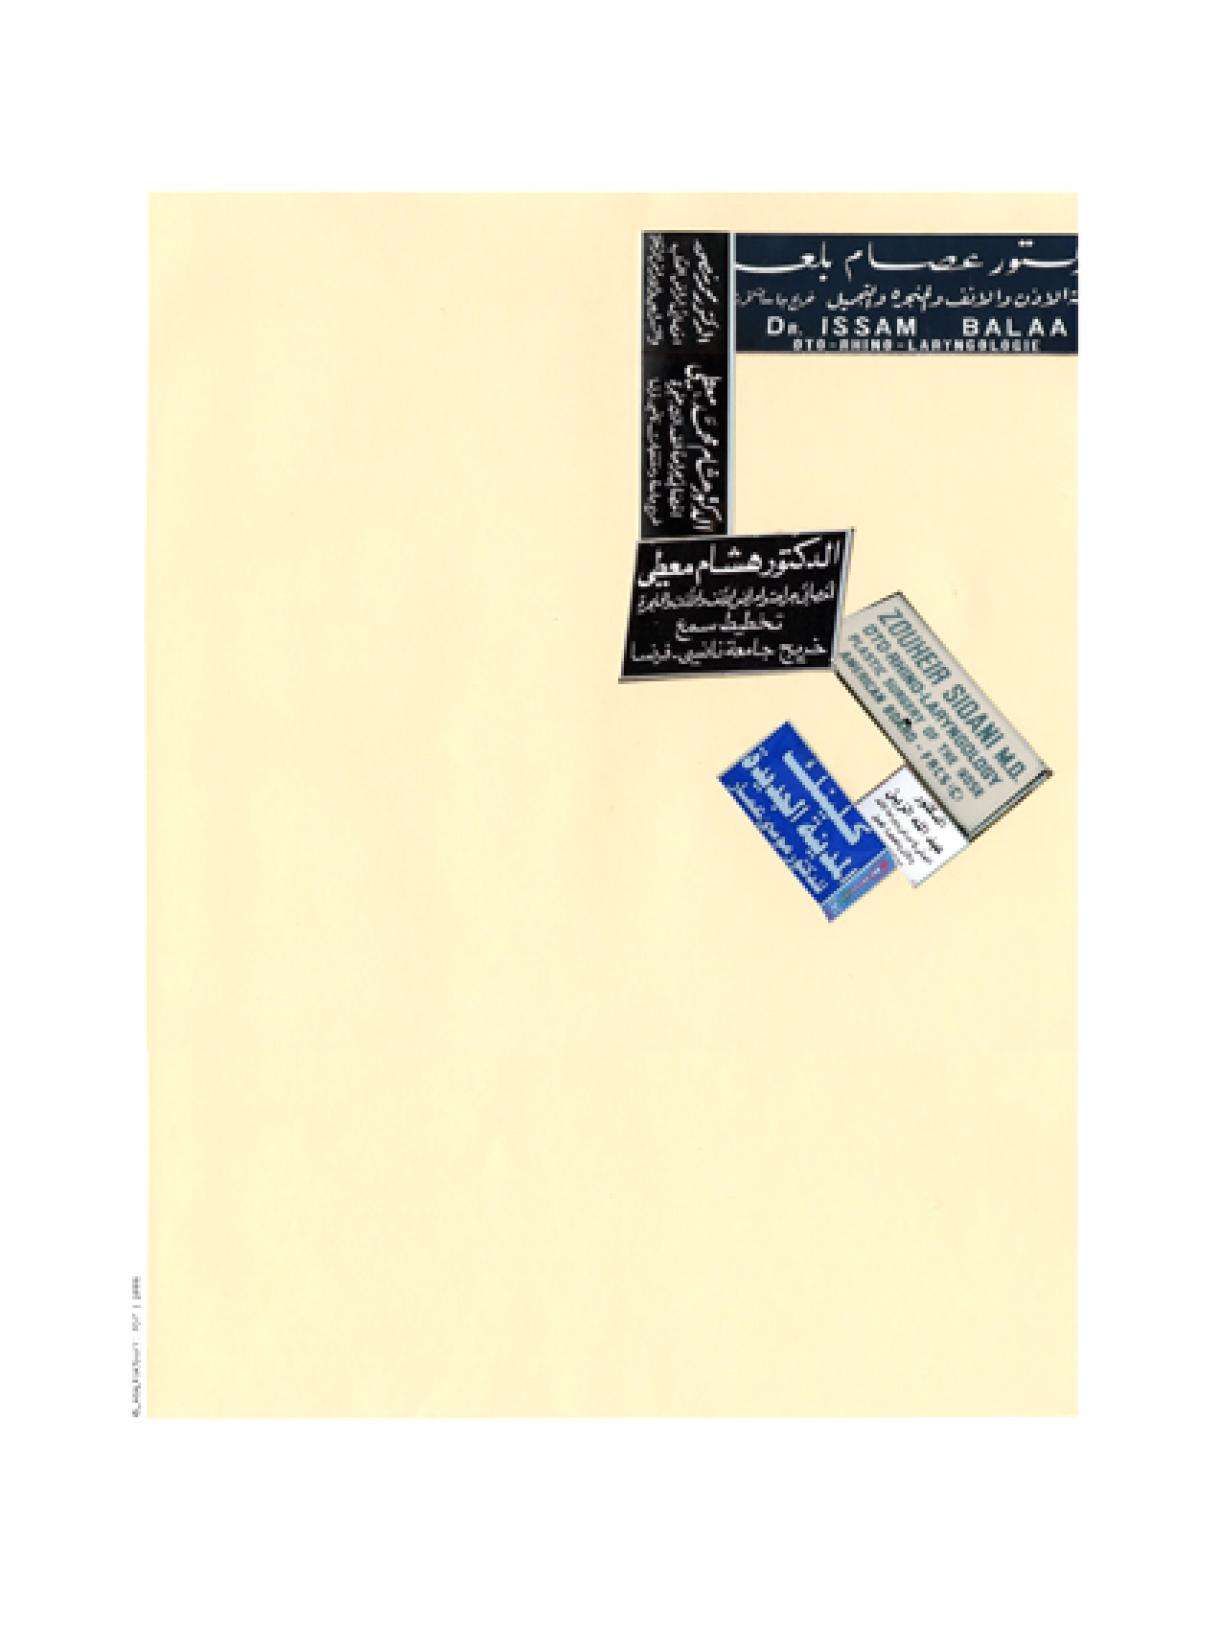 Notebook volume 57: Livre d'Or, 1992/2003, pigmented inkjet print, set of 15 plates, 30 x 40 cm, CompositeCov , AR-Fr